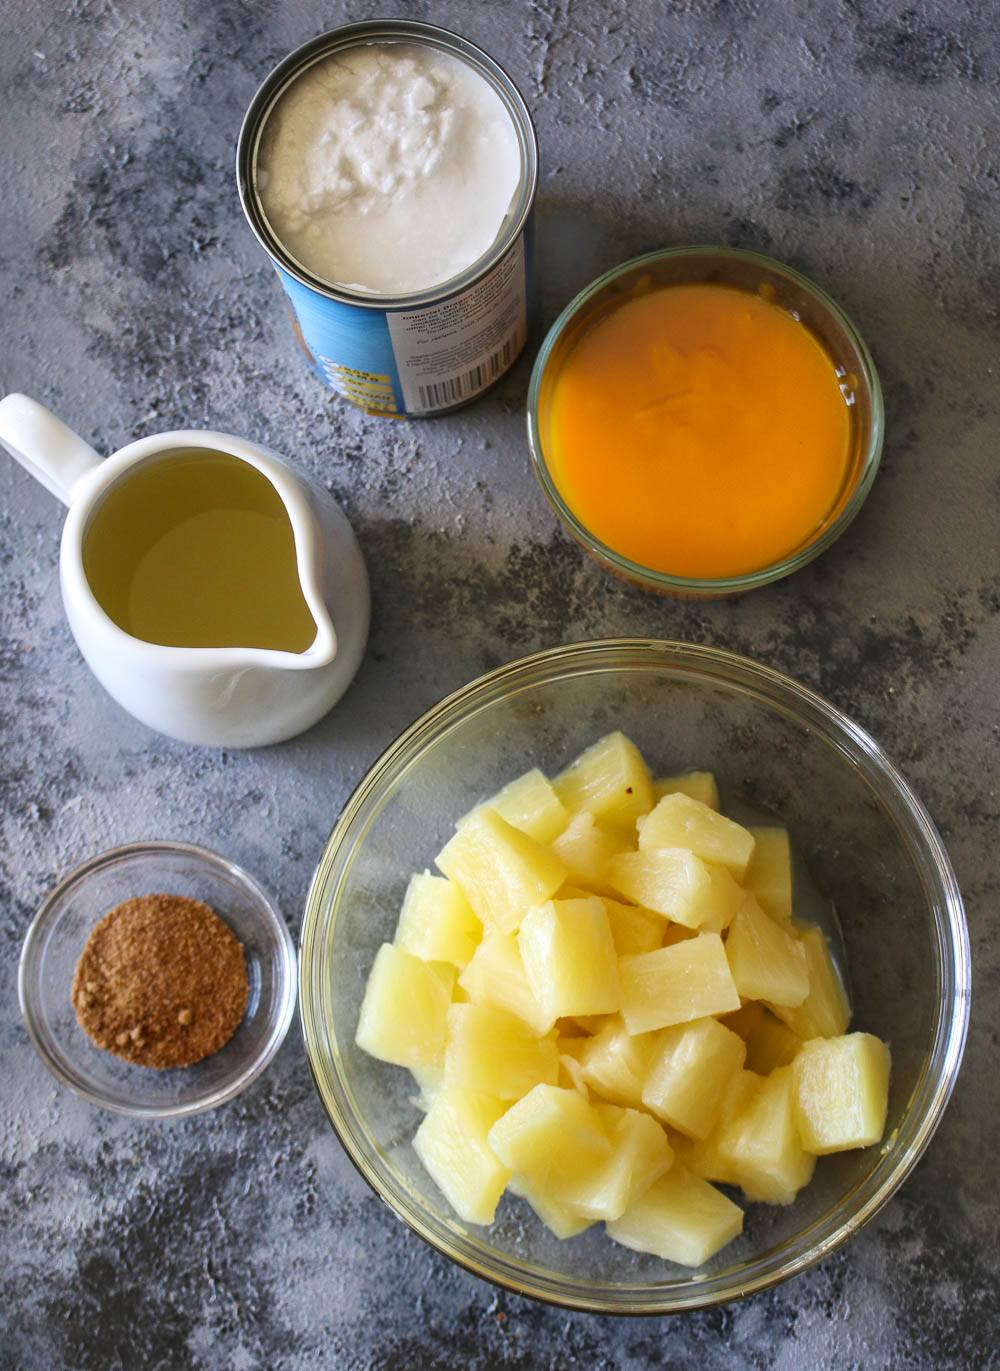 Ingredients required to make this Pineapple Mango Piña Colada